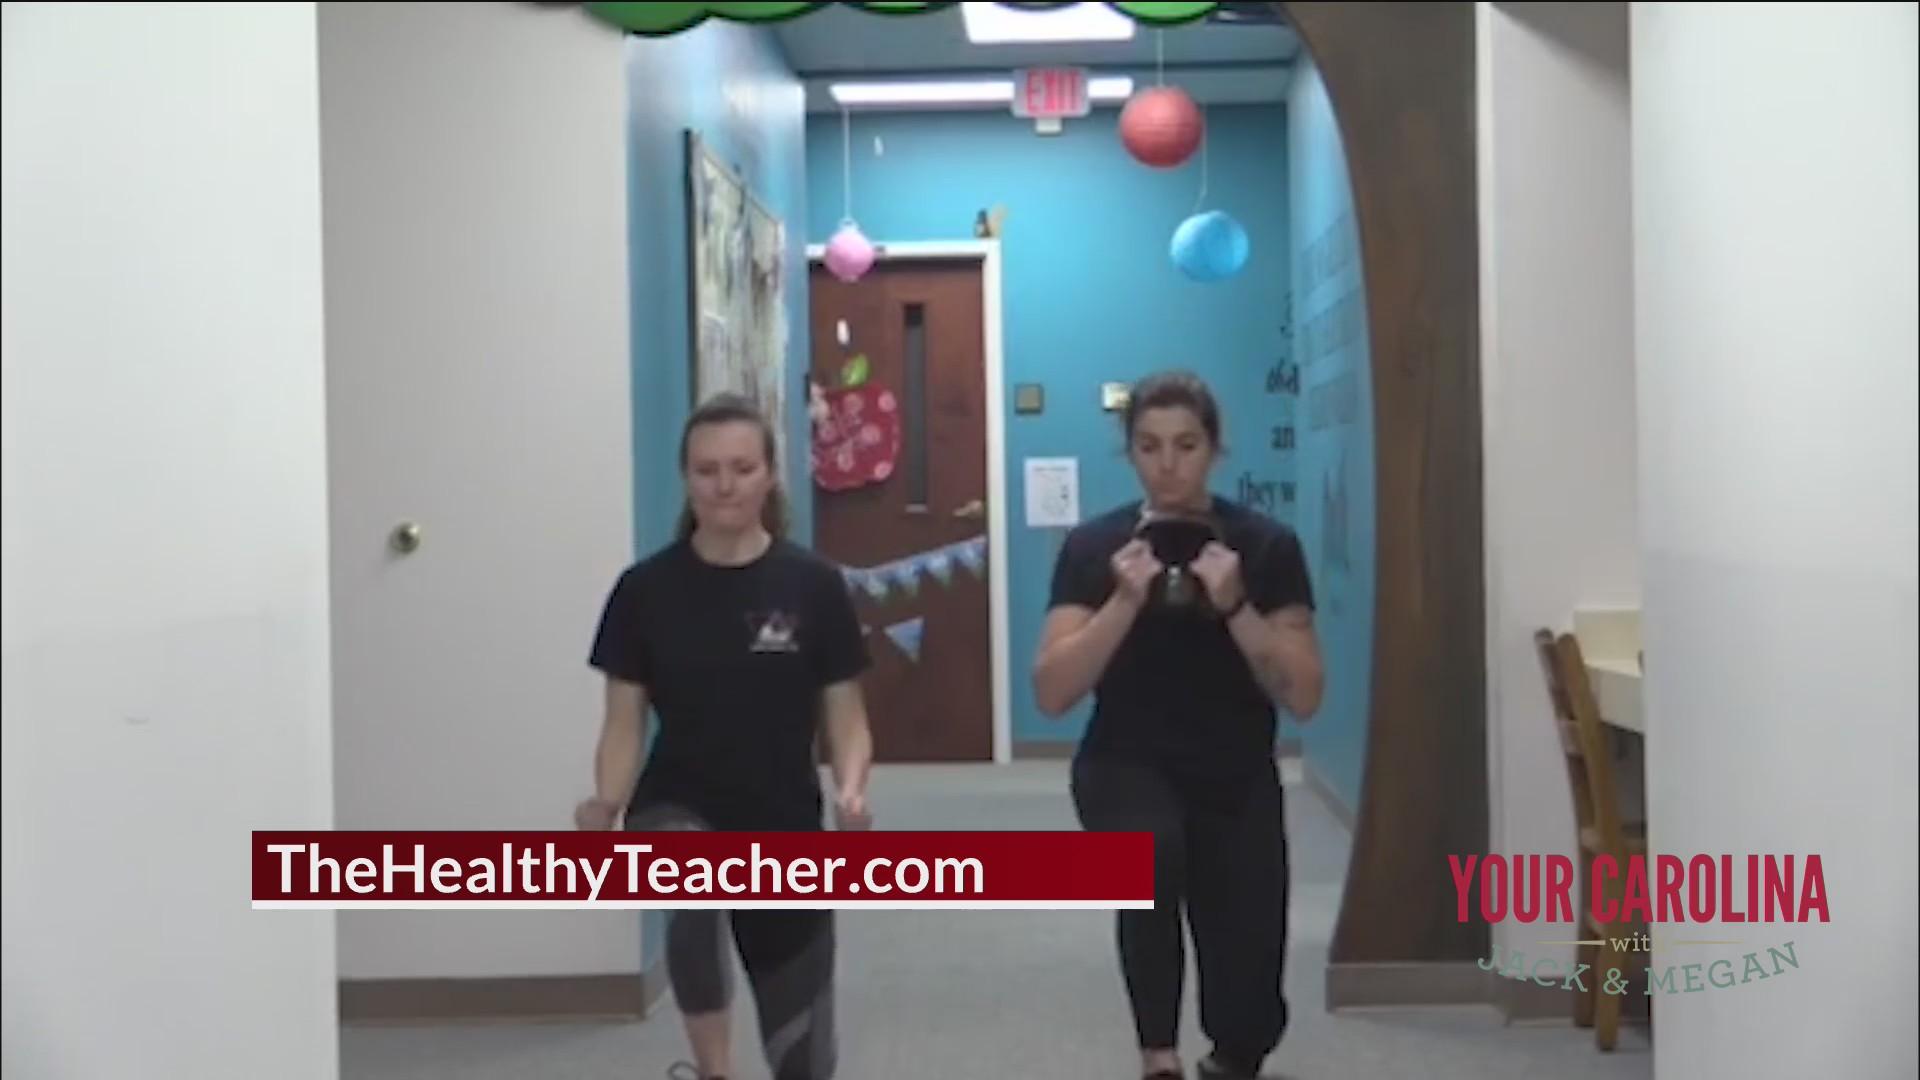 Move It Monday - The Healthy Teacher